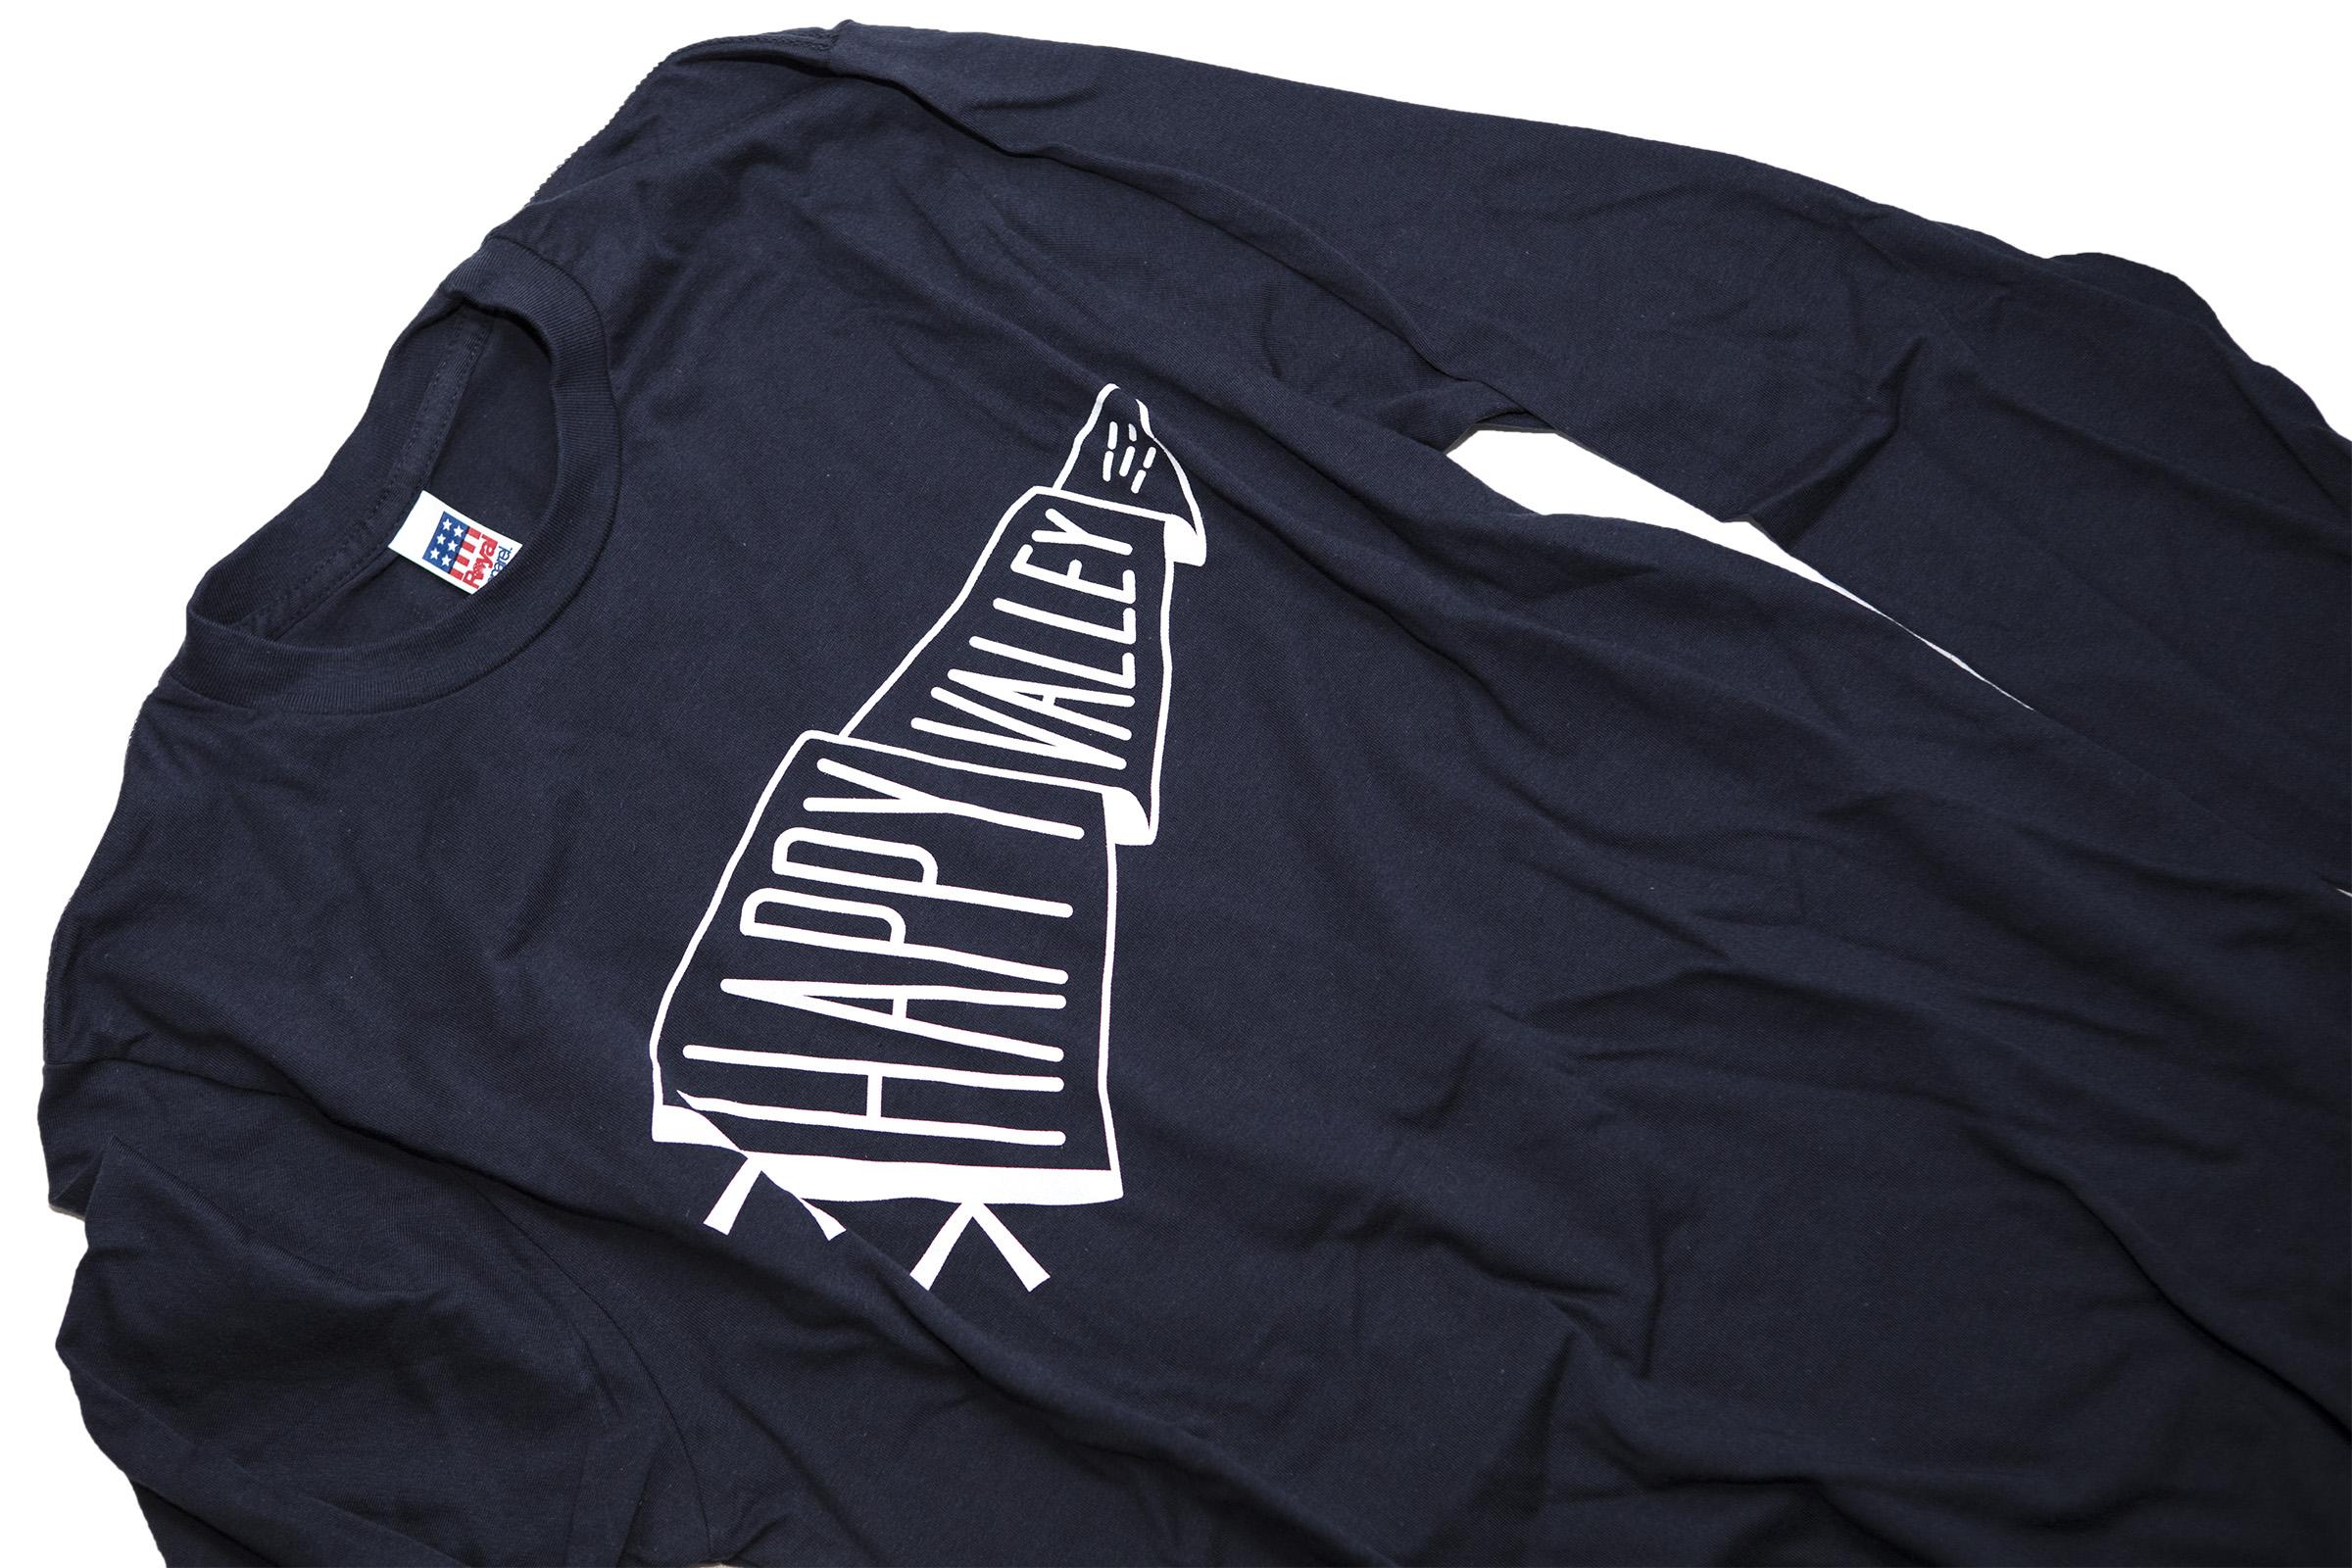 181014_stay_hershey_shirts_0003.JPG